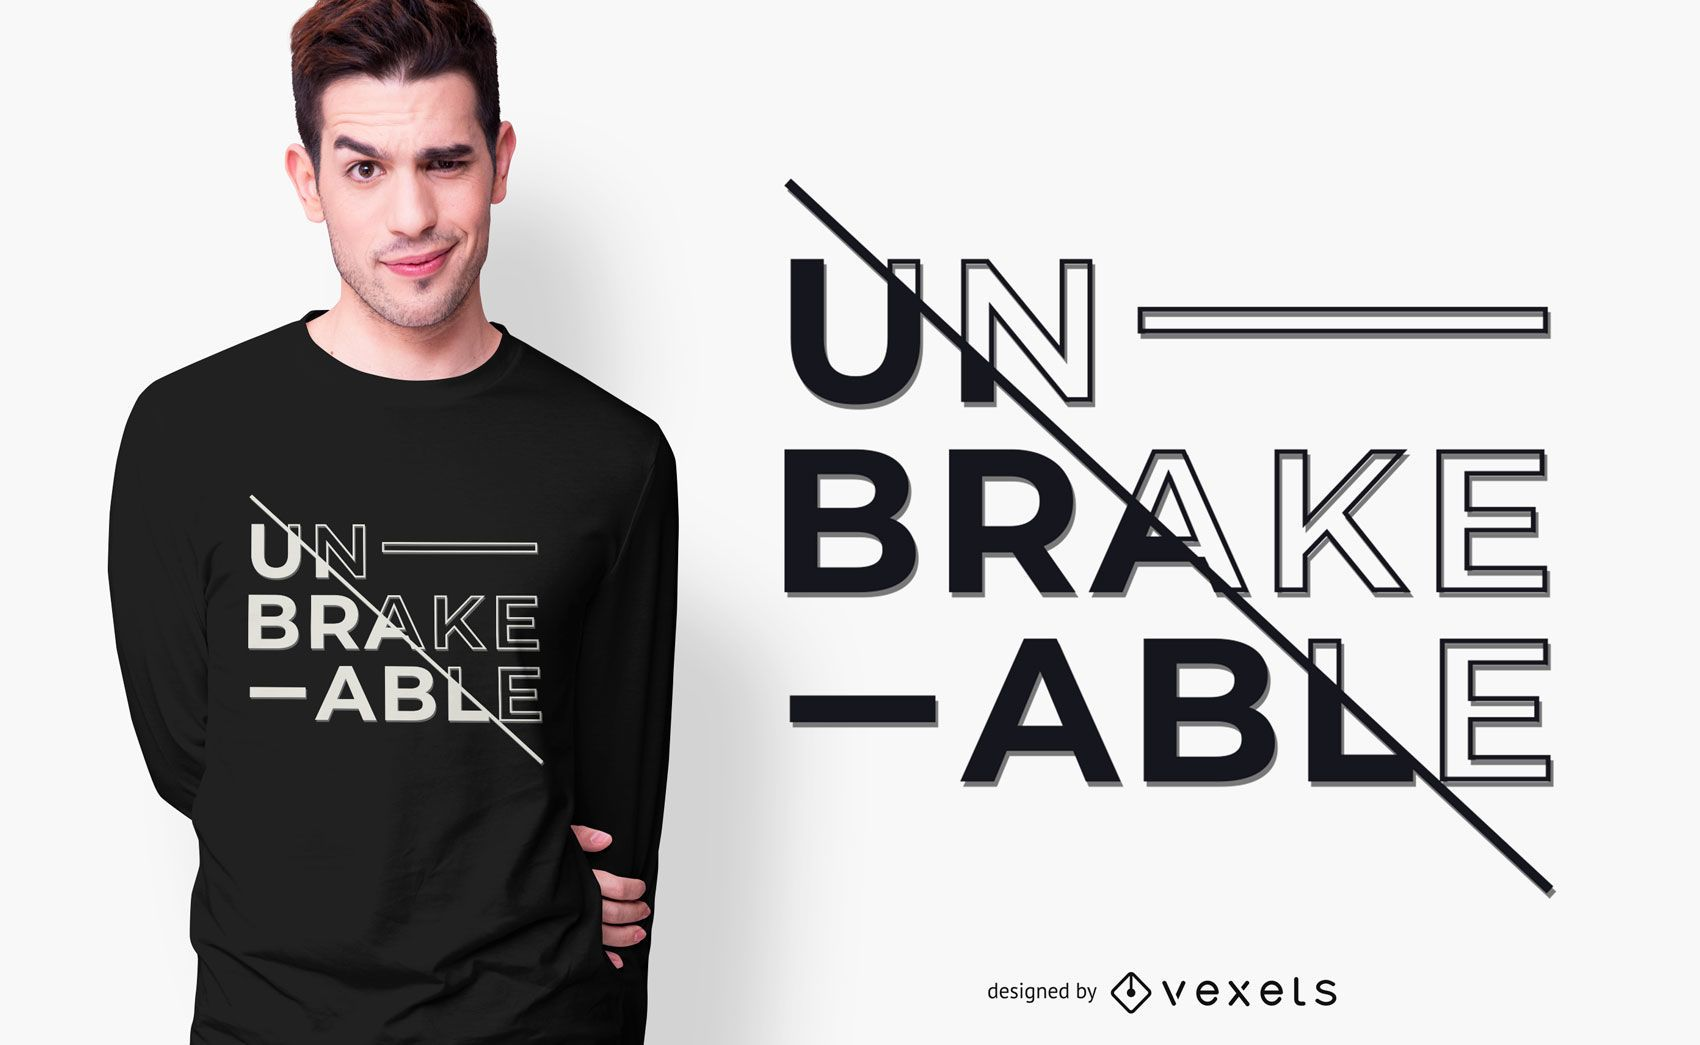 diseño de camiseta irrompible